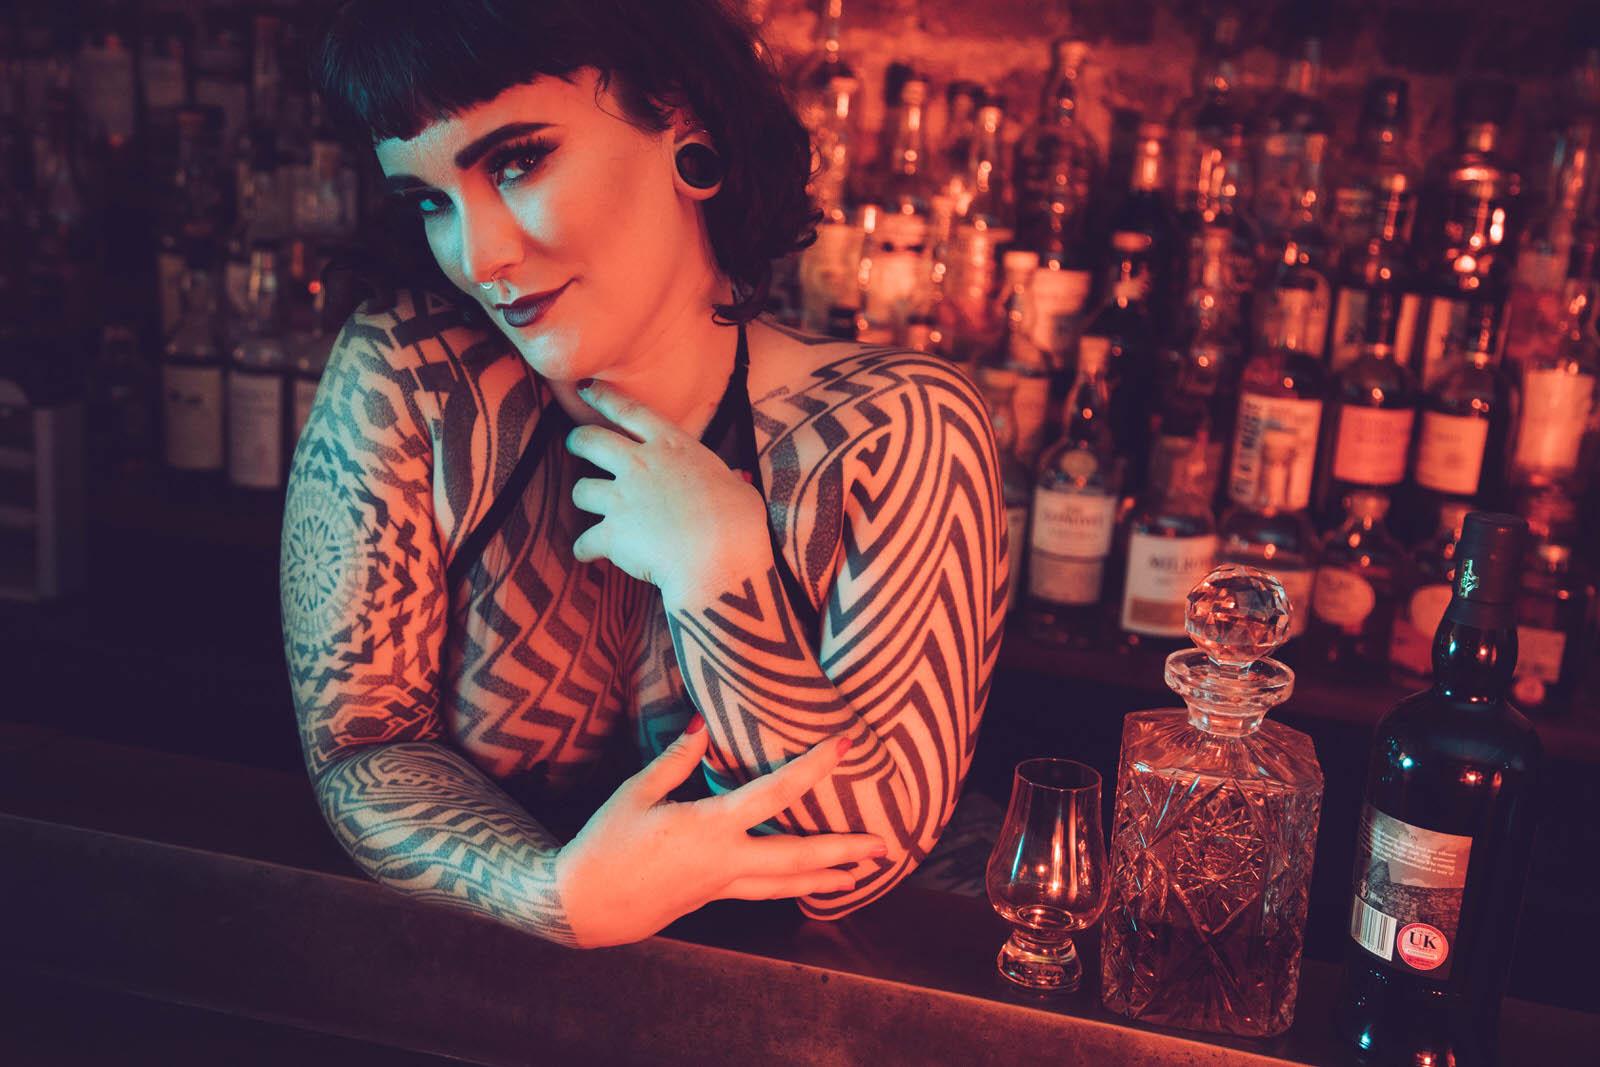 miss tallula peated scotch whisky mesh bra fetish clothing see through clothes sydney whisky whiskey date whiskey bar.jpg